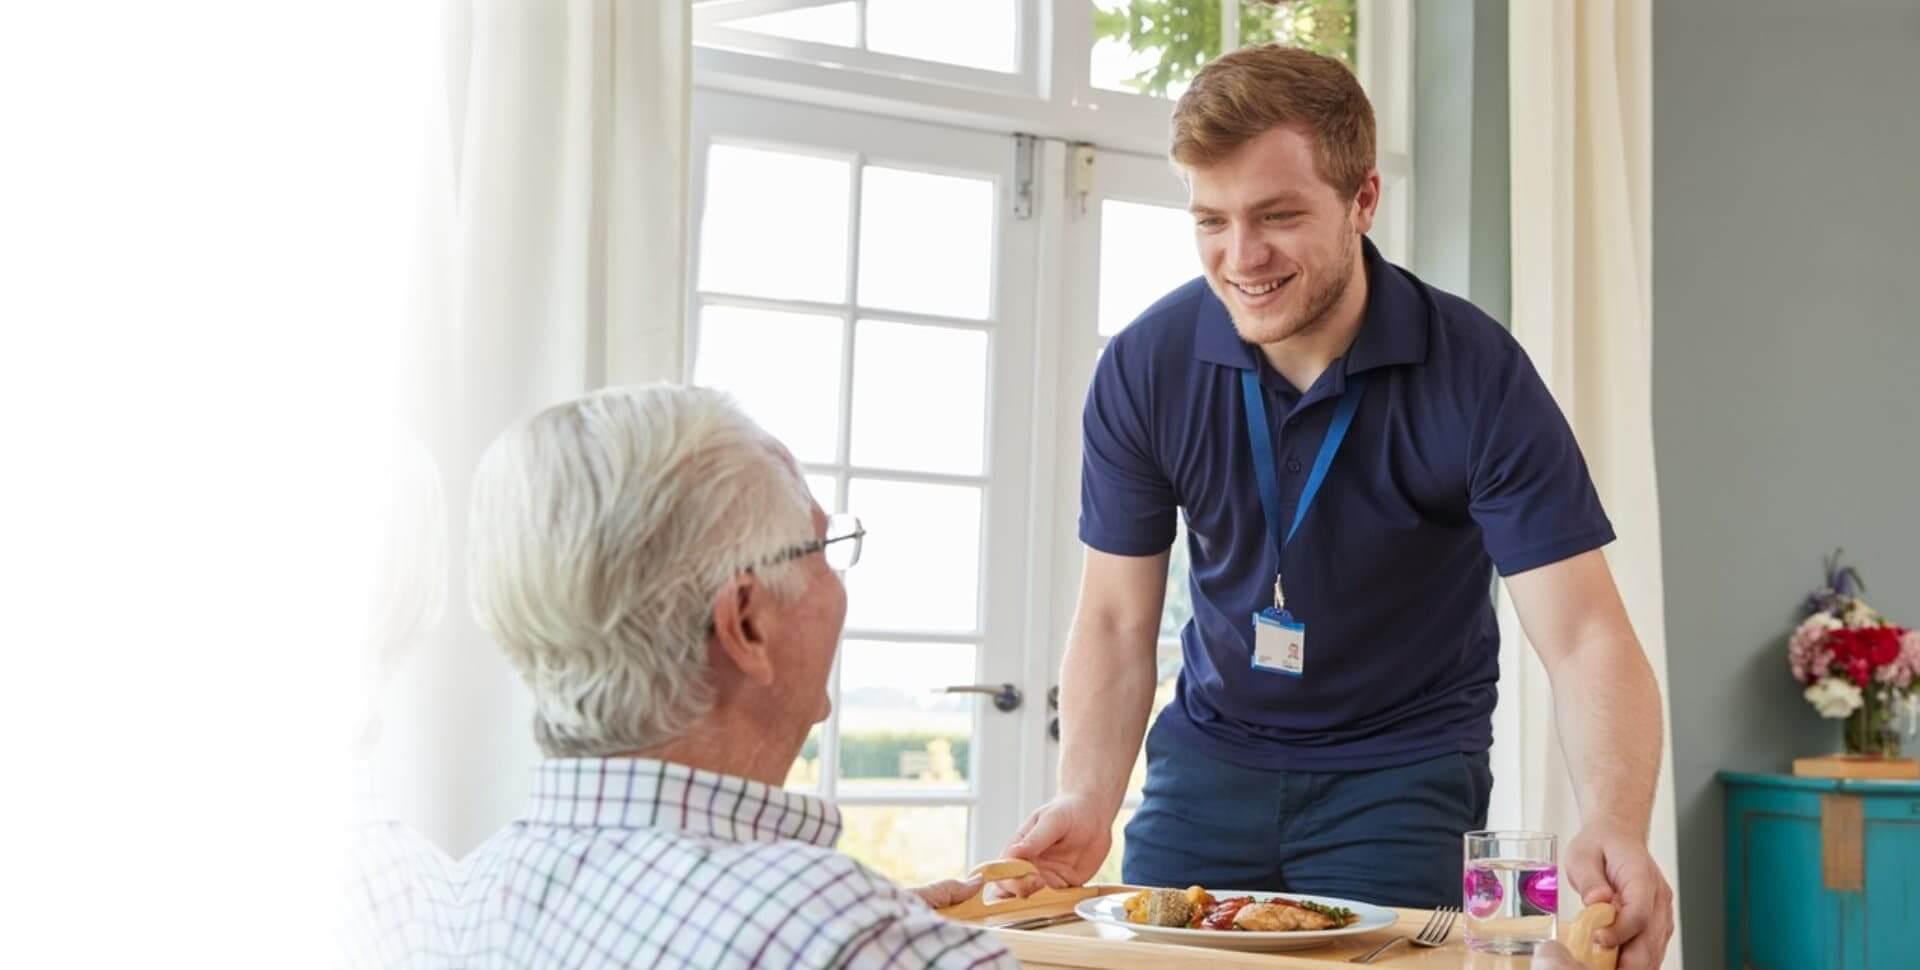 caregiver serving a food to senior man